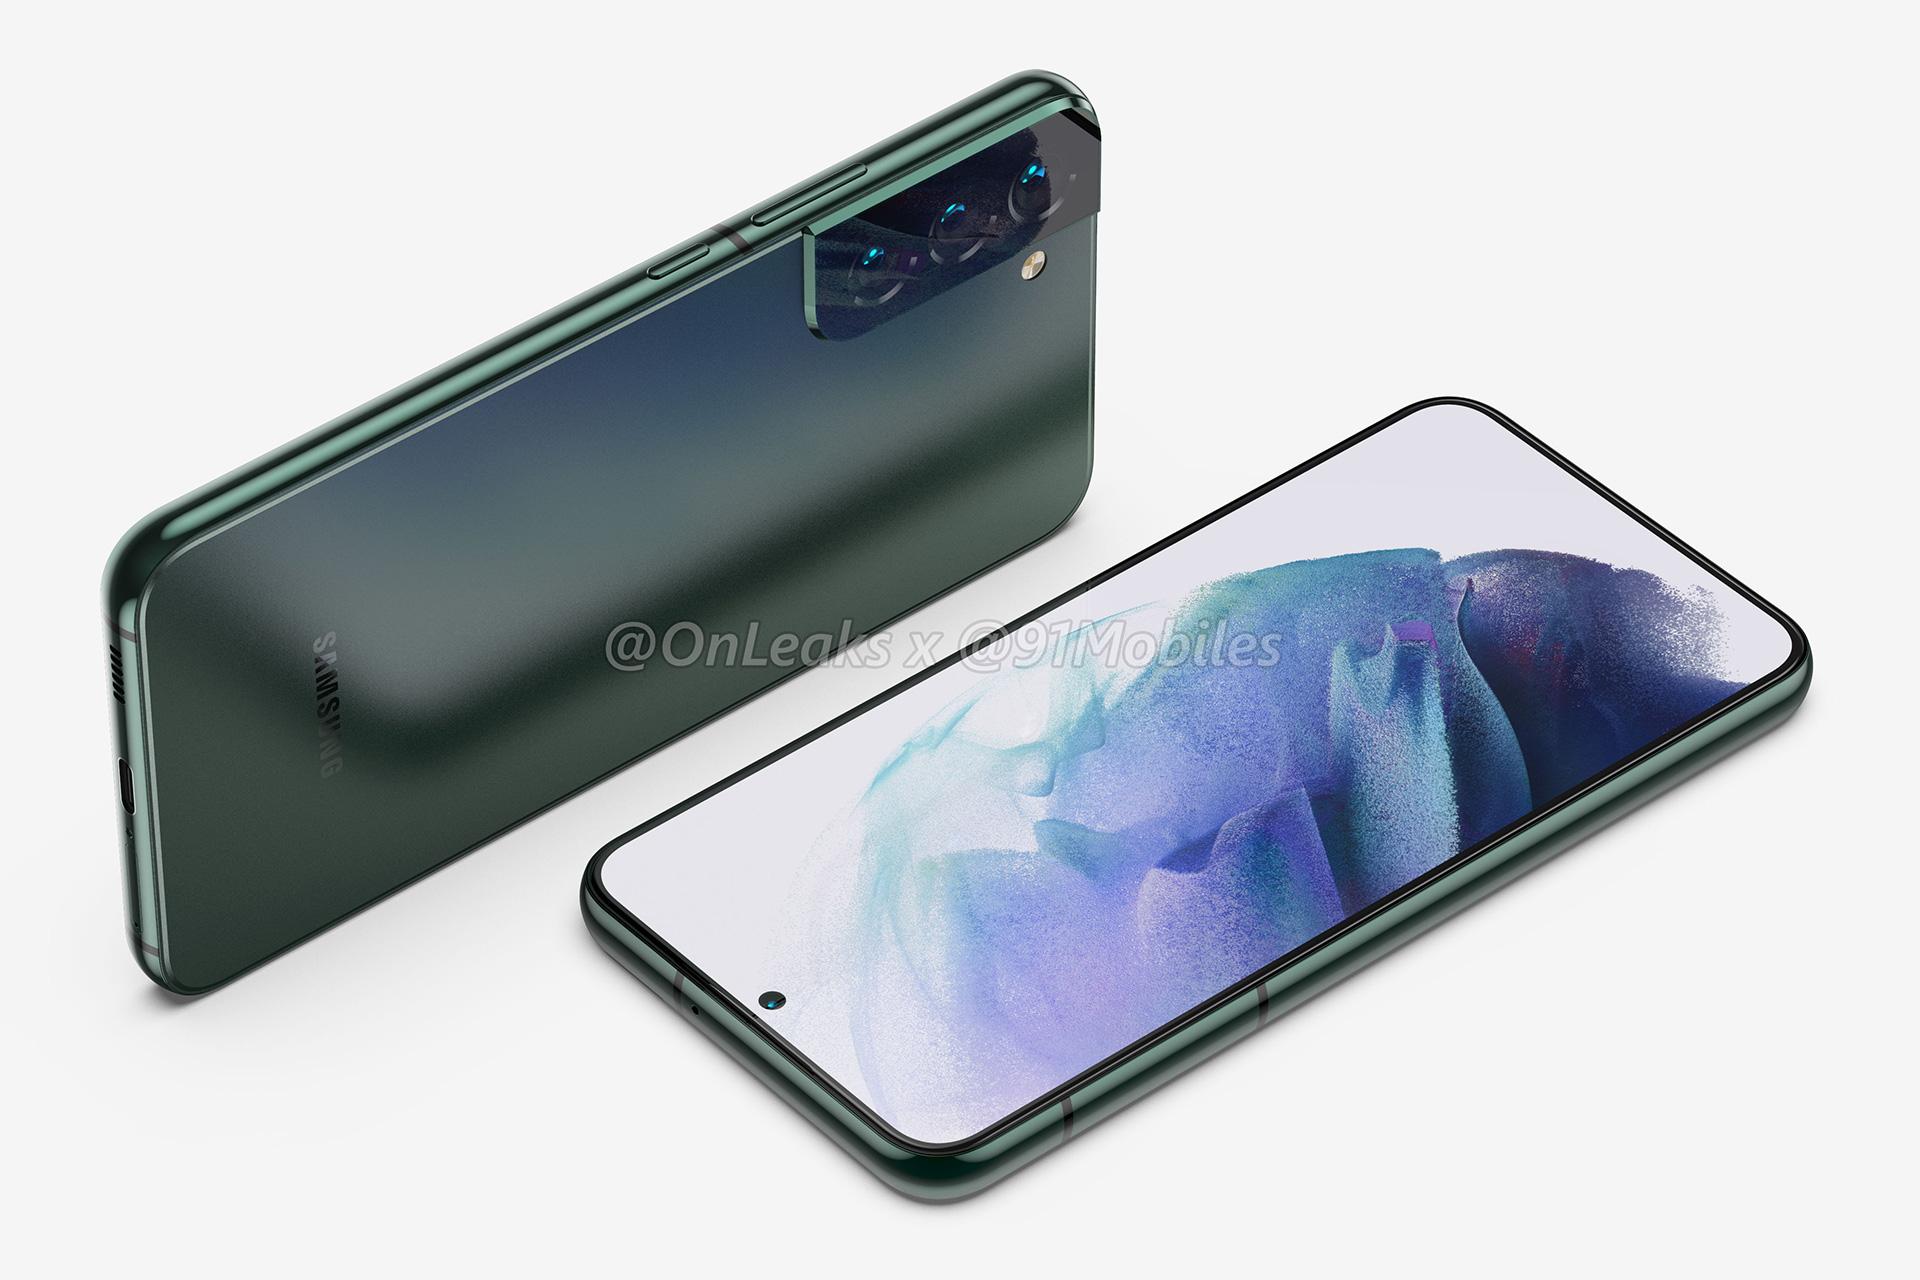 Samsung Galaxy S22+ image leak